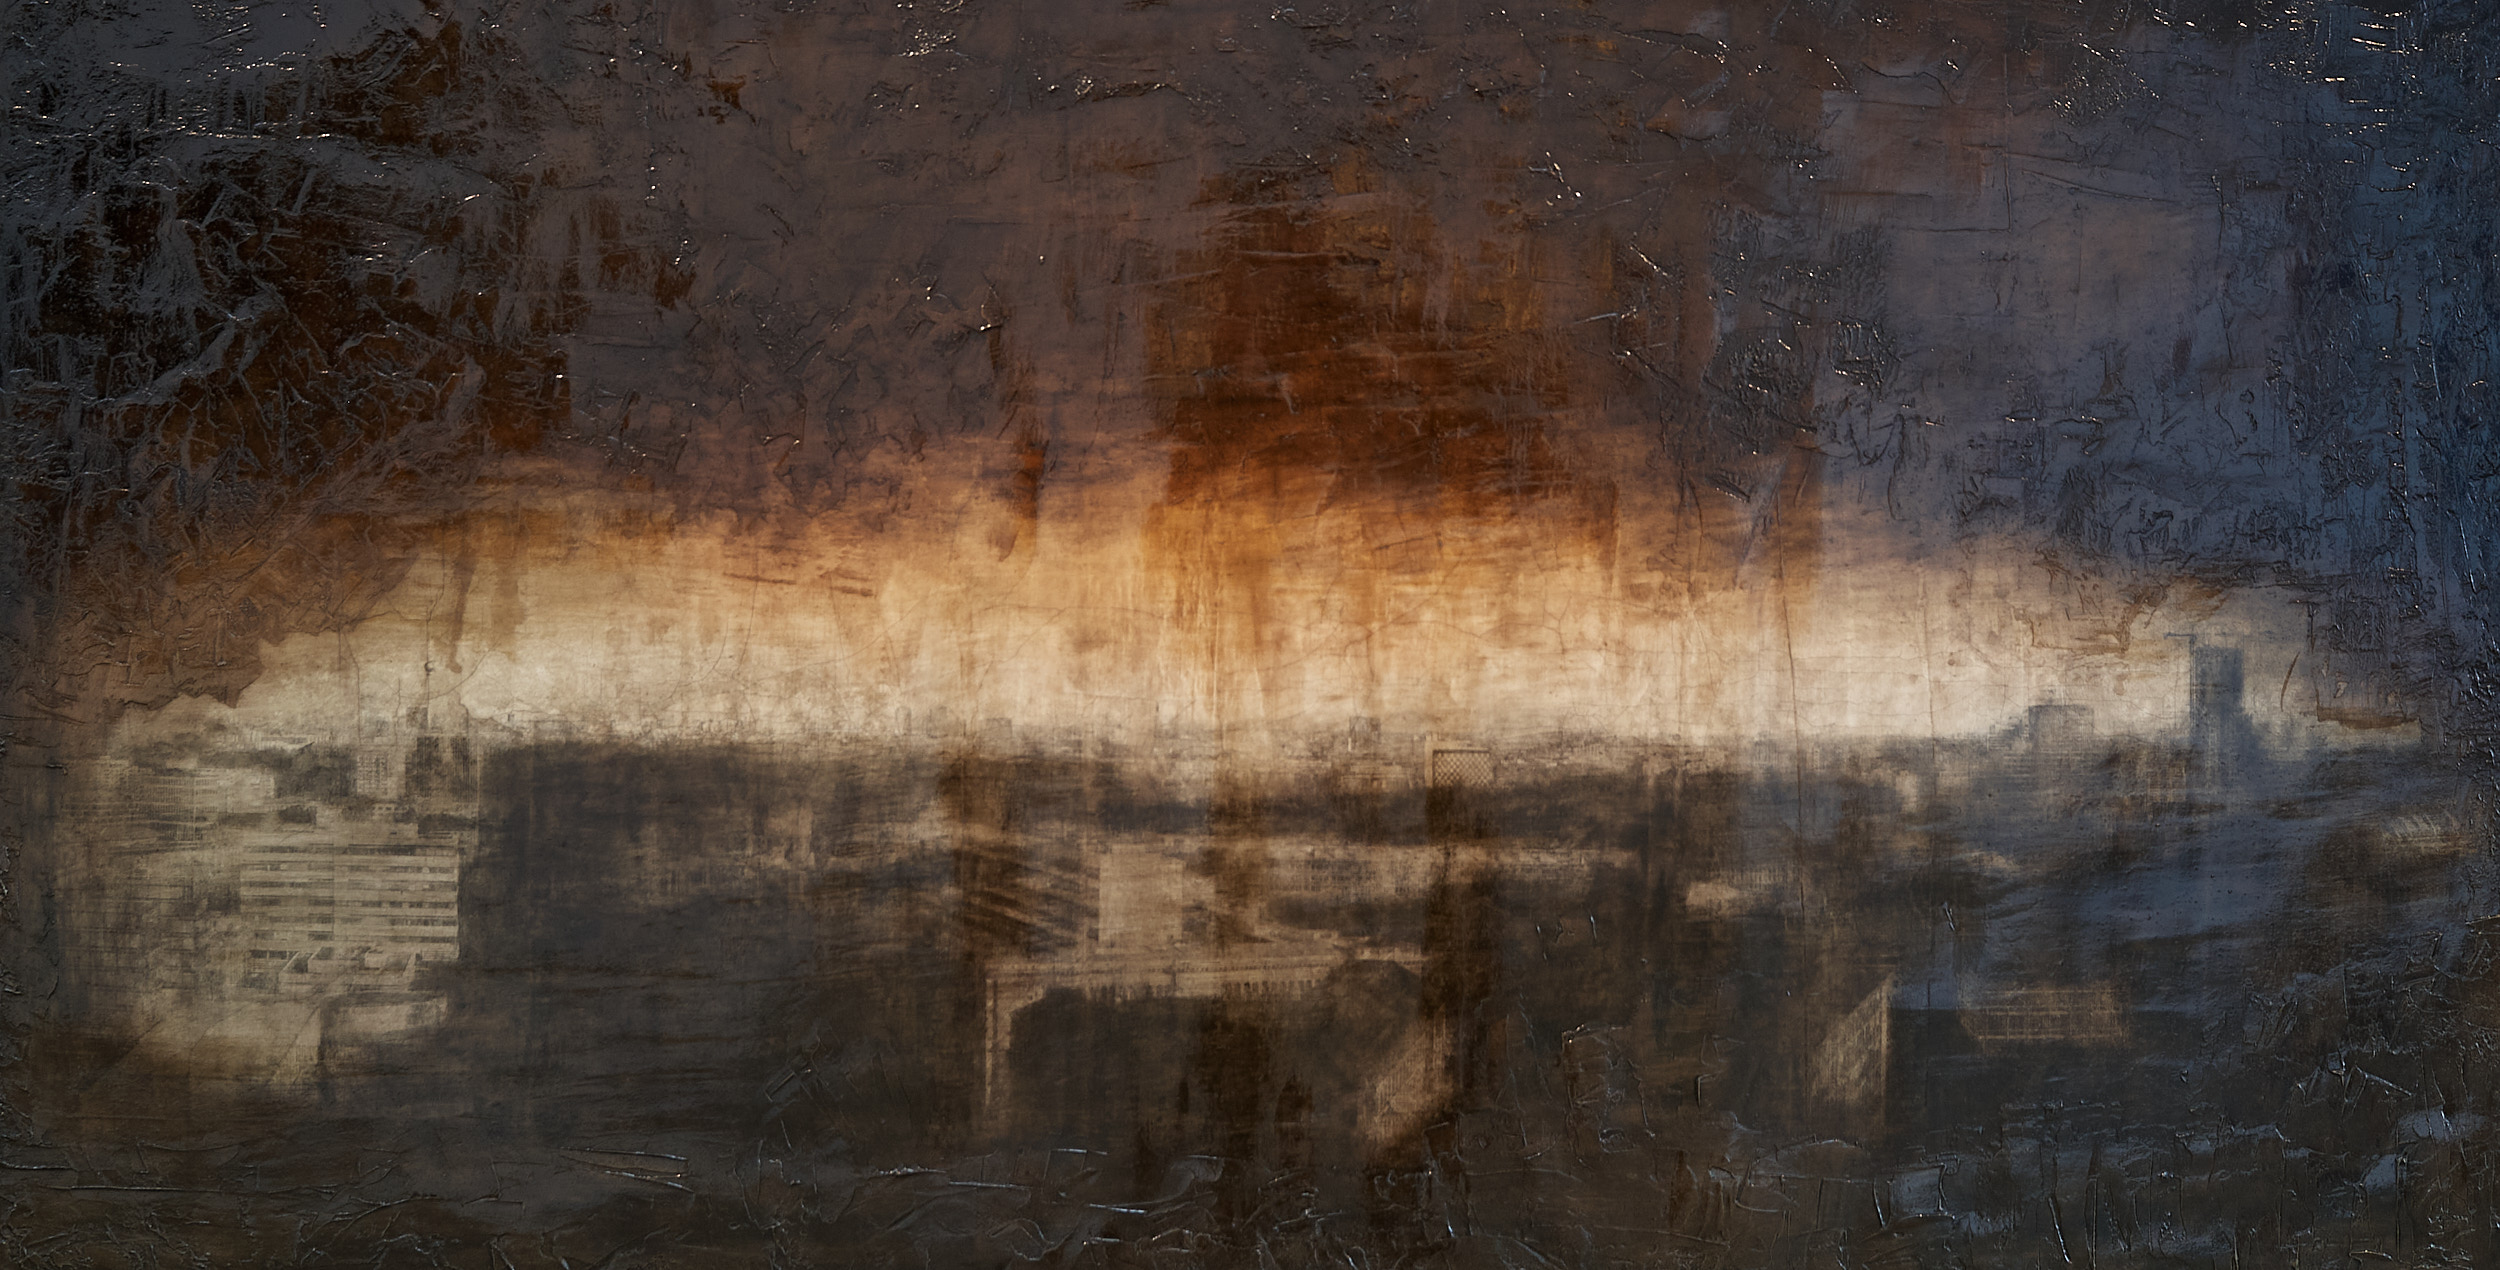 Toteninsel mit Großstadtmotiv